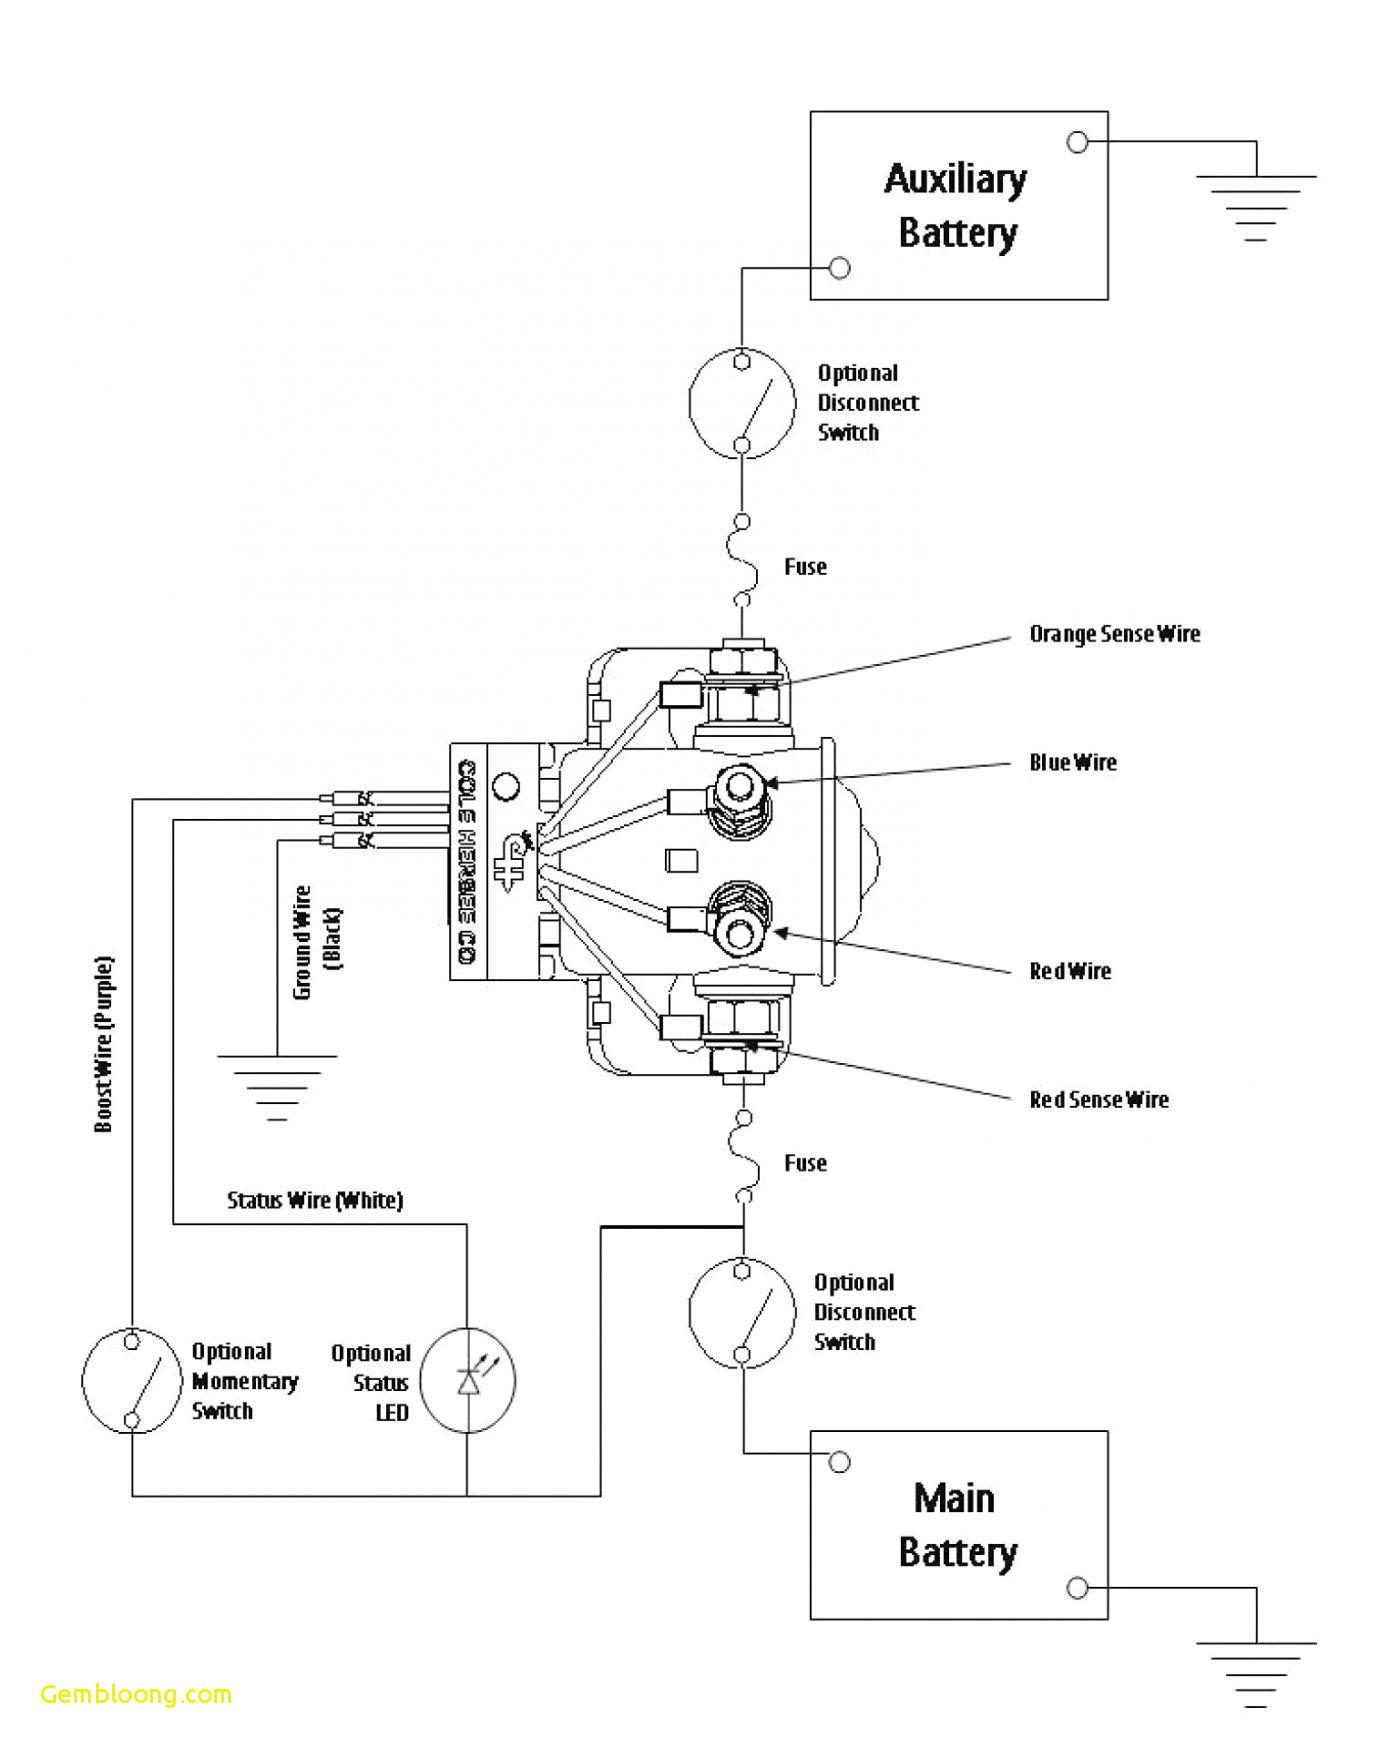 Free Bmw E36 Dme Wiring Diagram E46 Ignition Switch Wiring Diagram - Switch Wiring Diagram